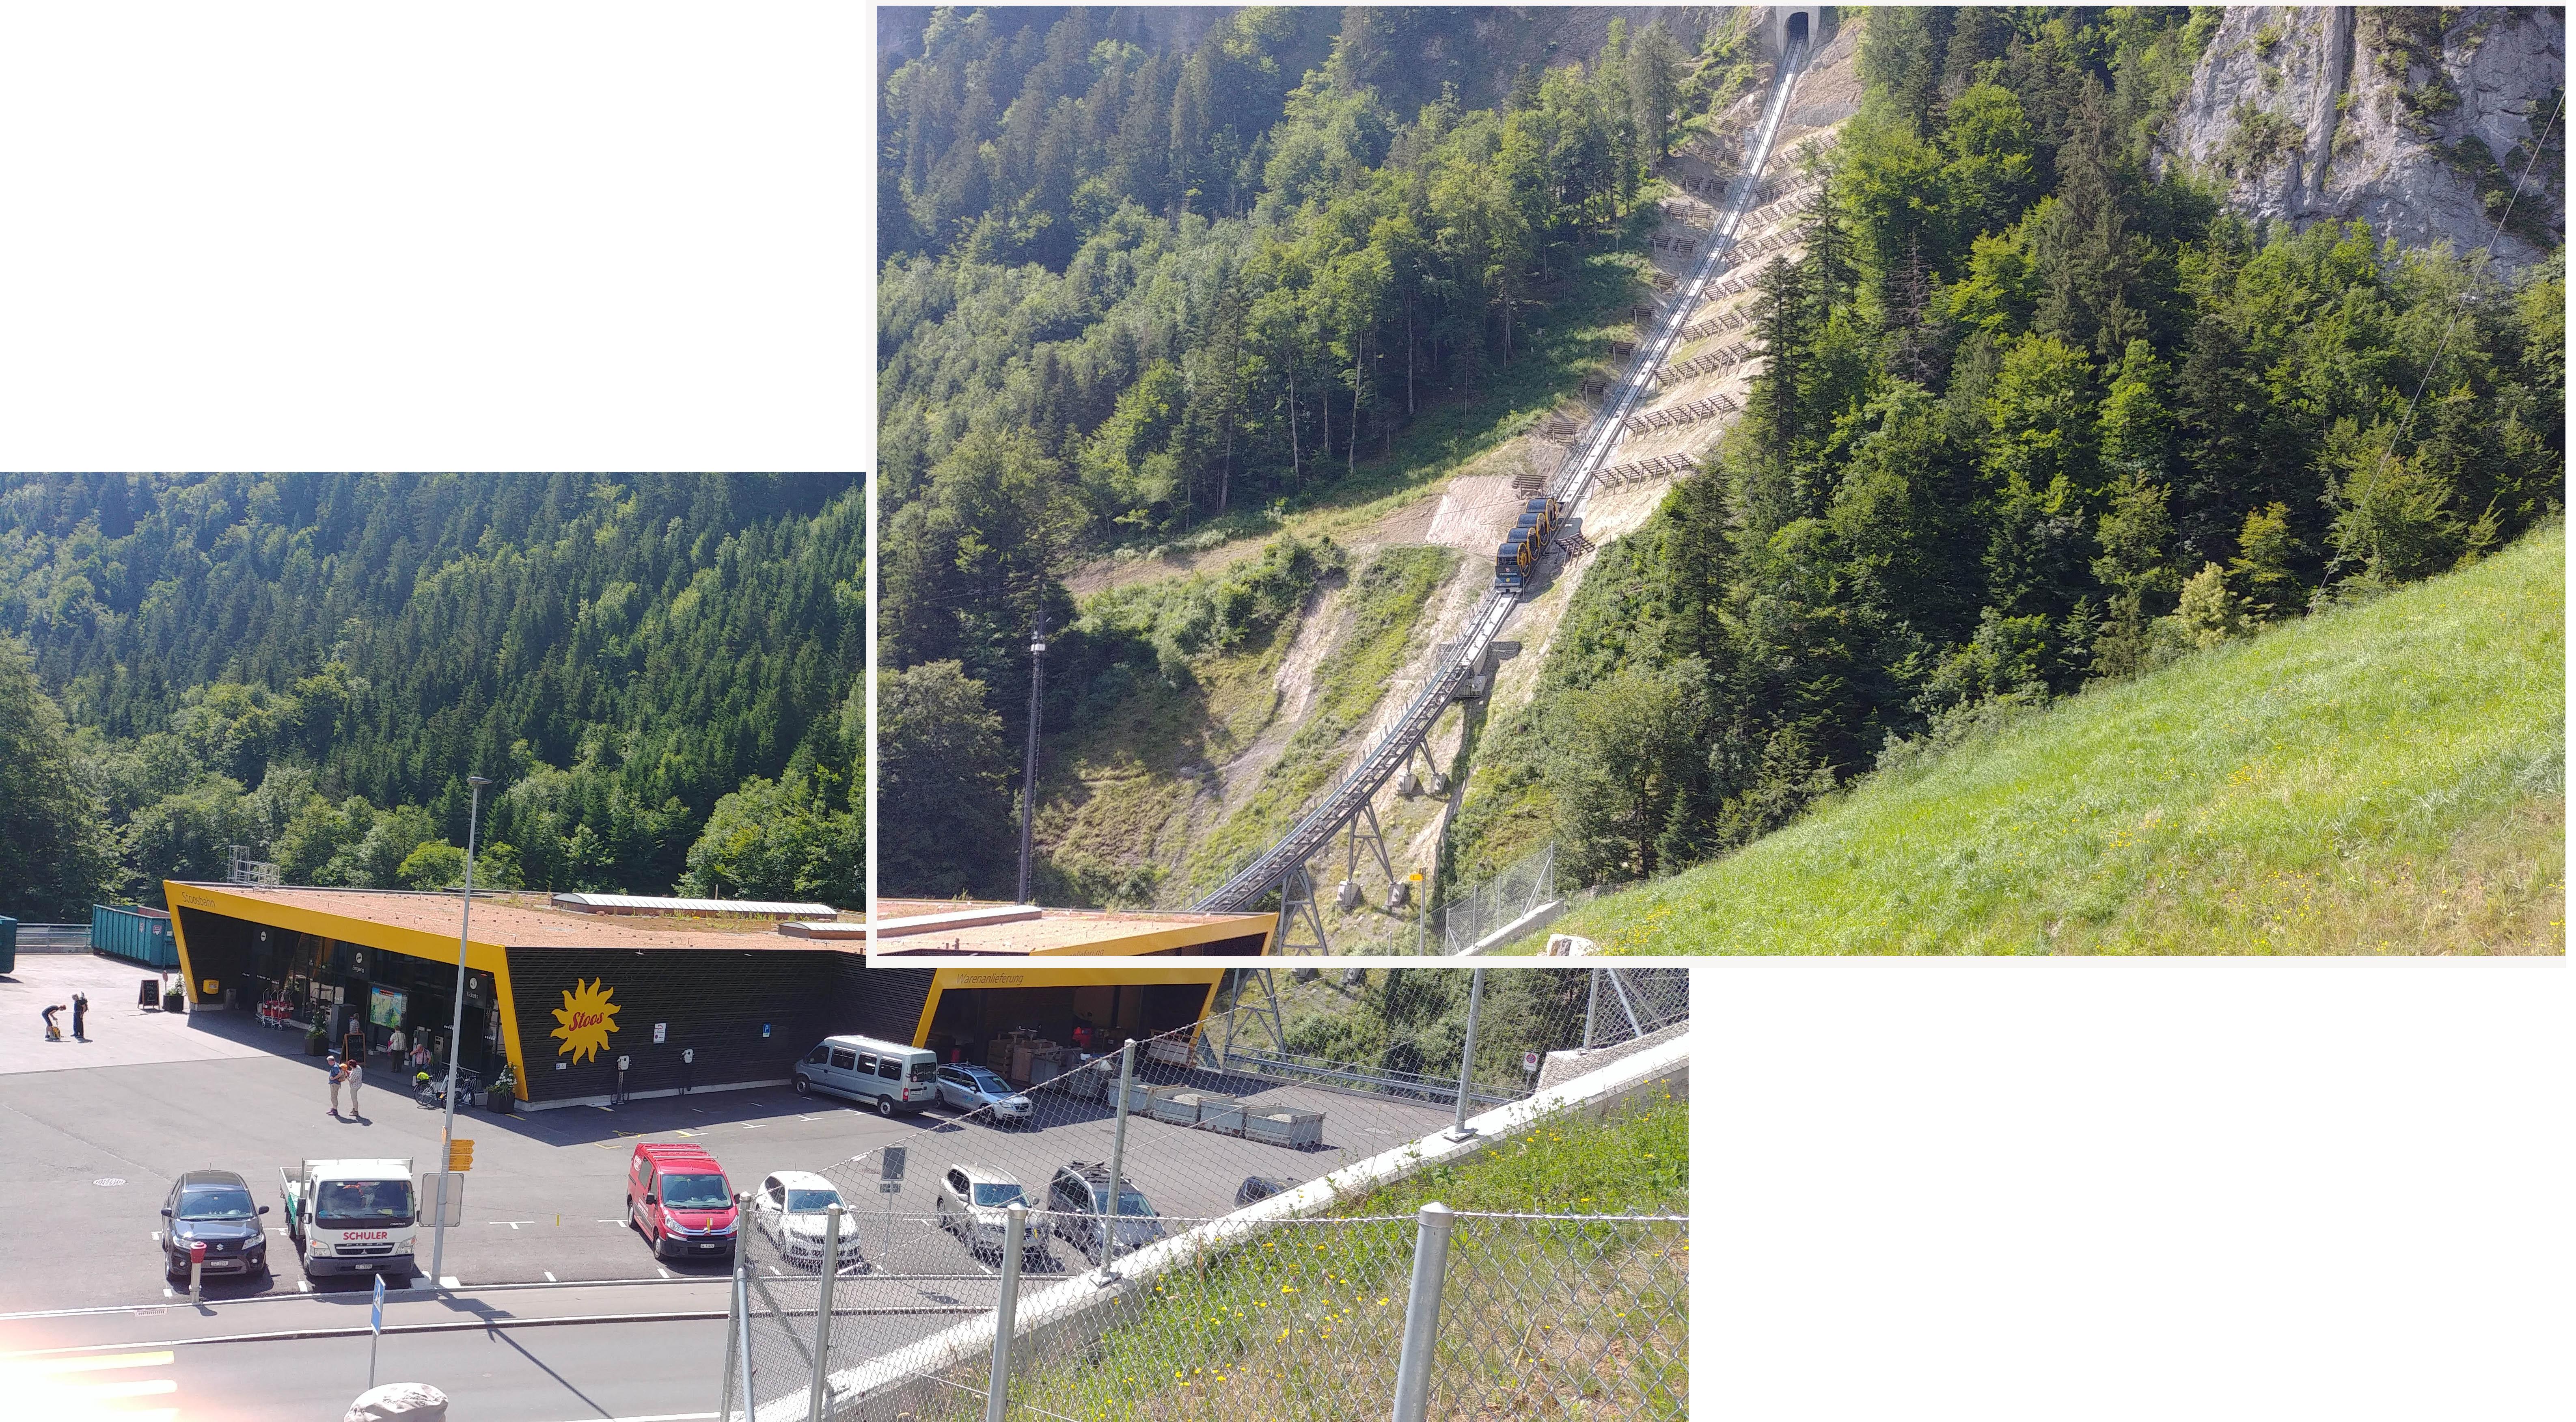 Stoosbahn (funicular lower station)